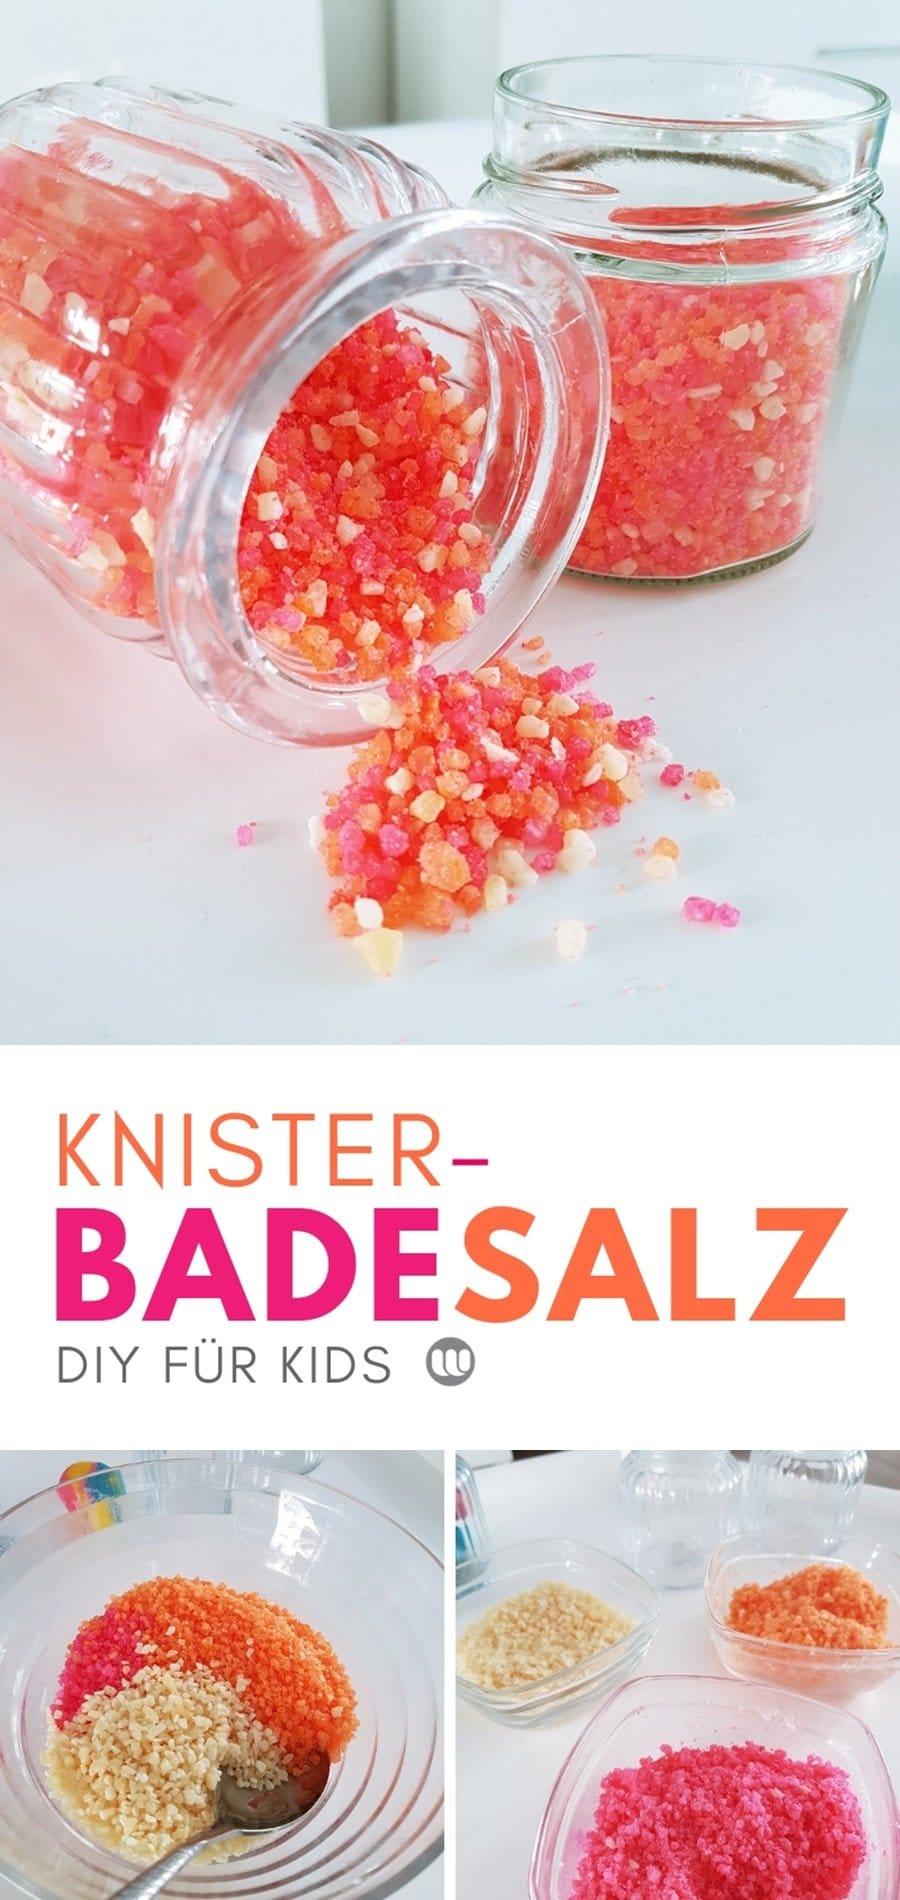 Knisterbad Rezept Badesalz für Kinder